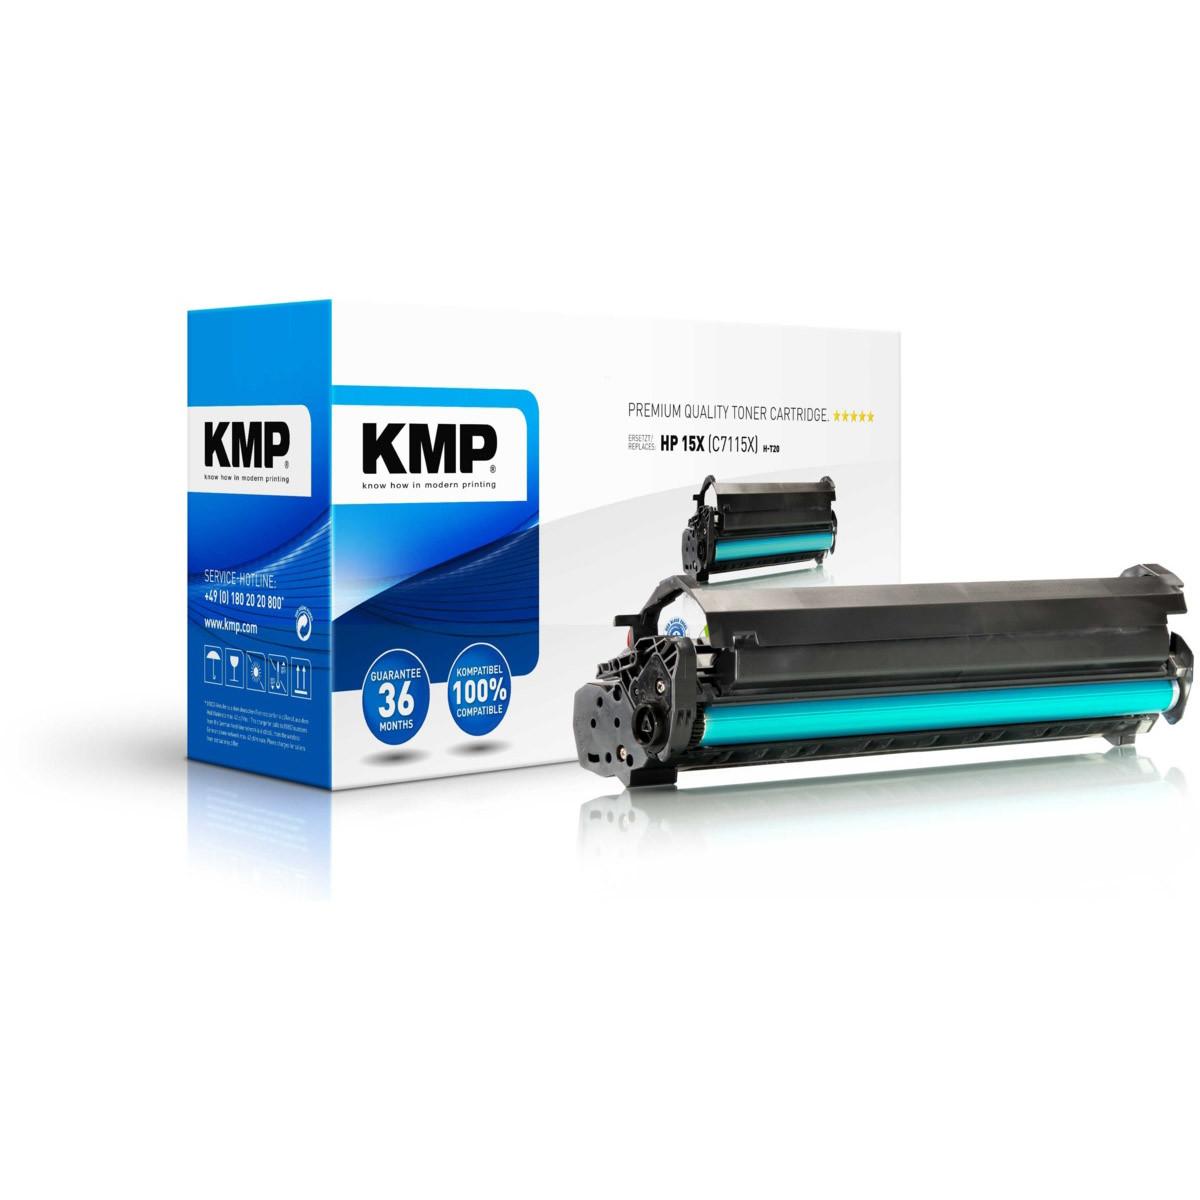 KMP Toner HP 15X, HP C7115X, - kompatibilný s čipom (Čierny)